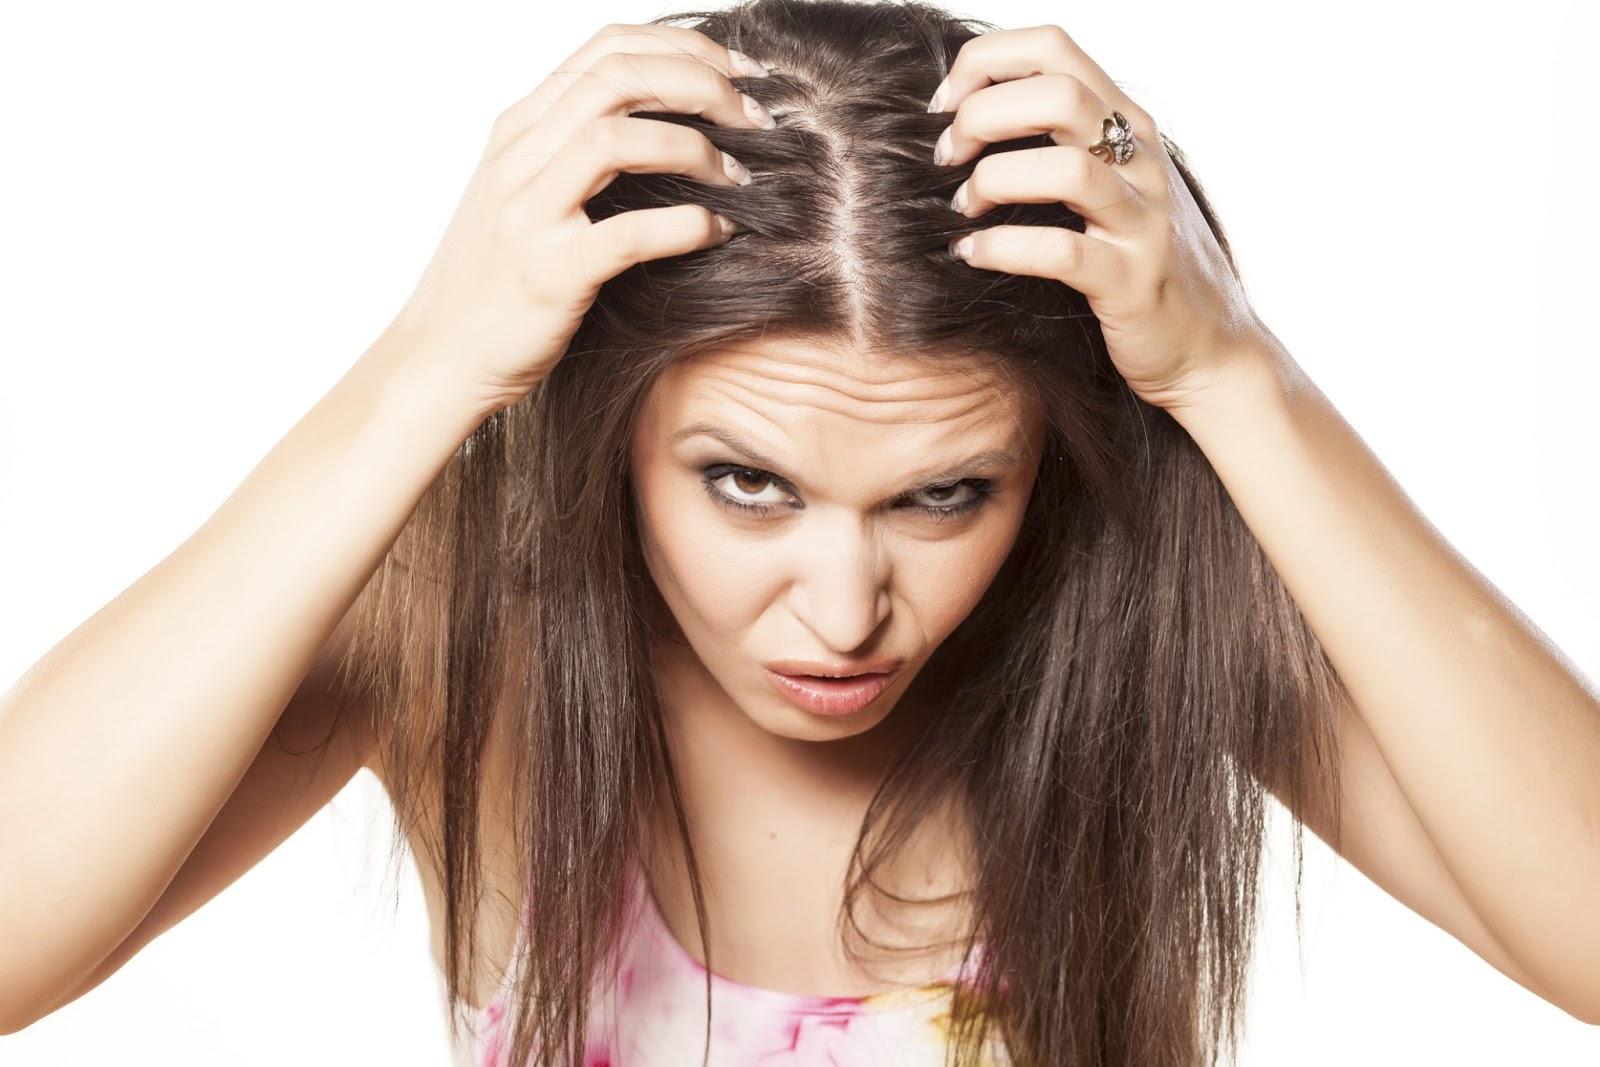 Image result for बालो का झड़ना